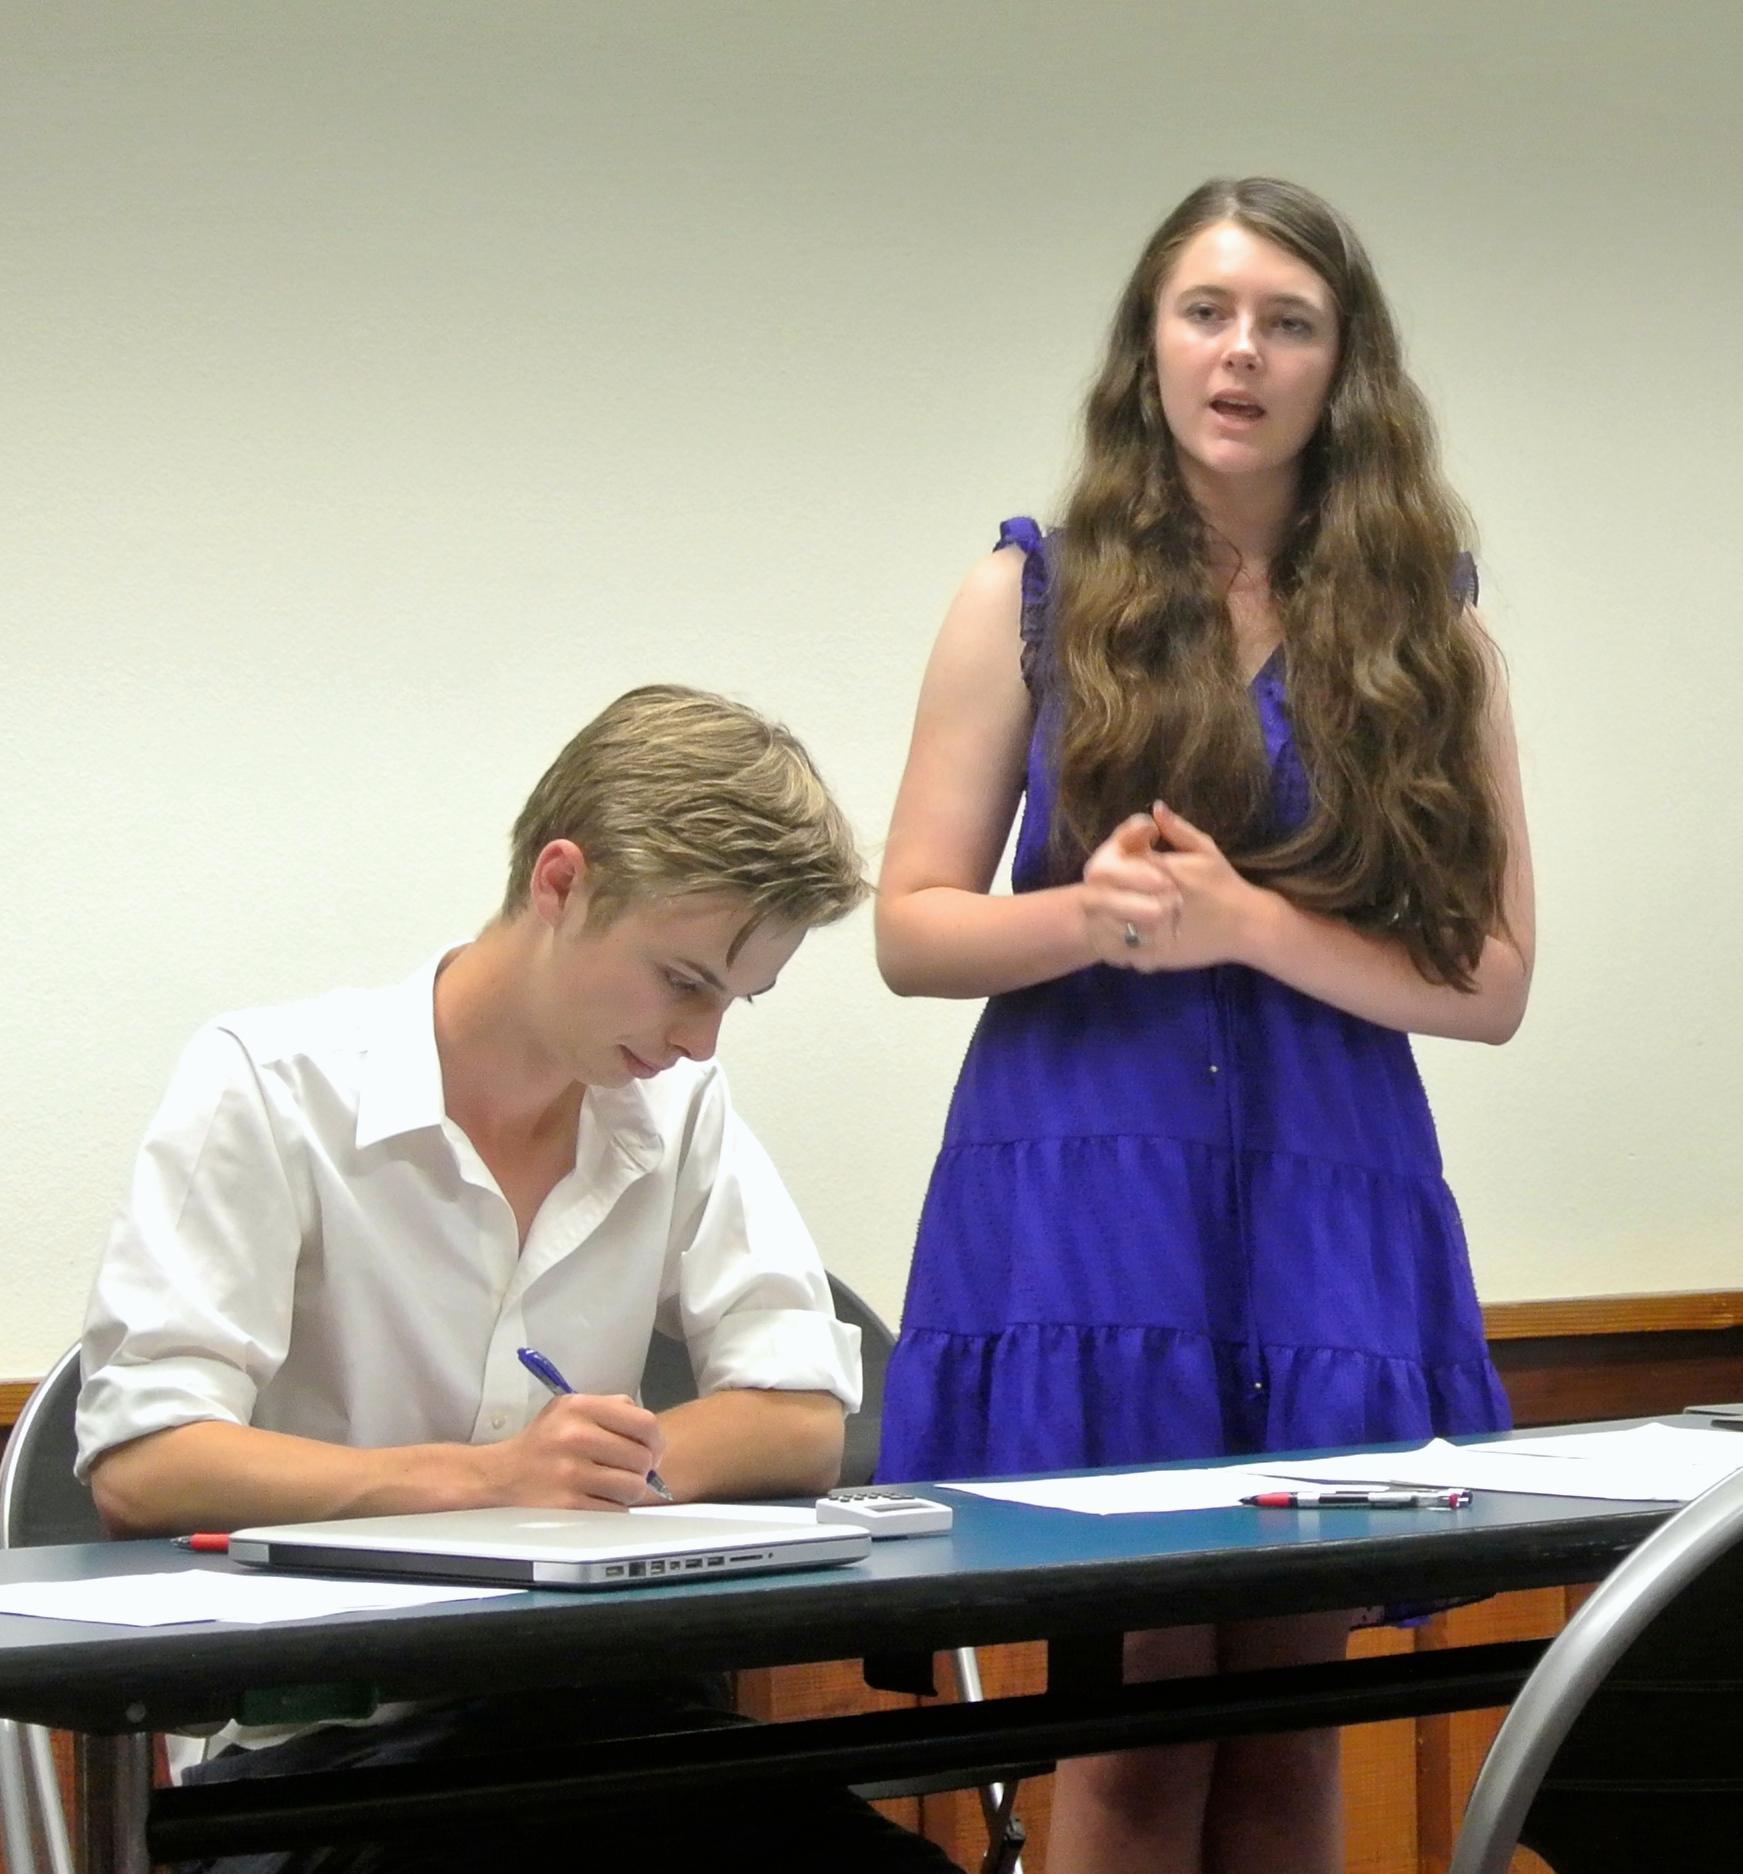 Maciorowski delivers her constructive speech in sems and Noel flows.